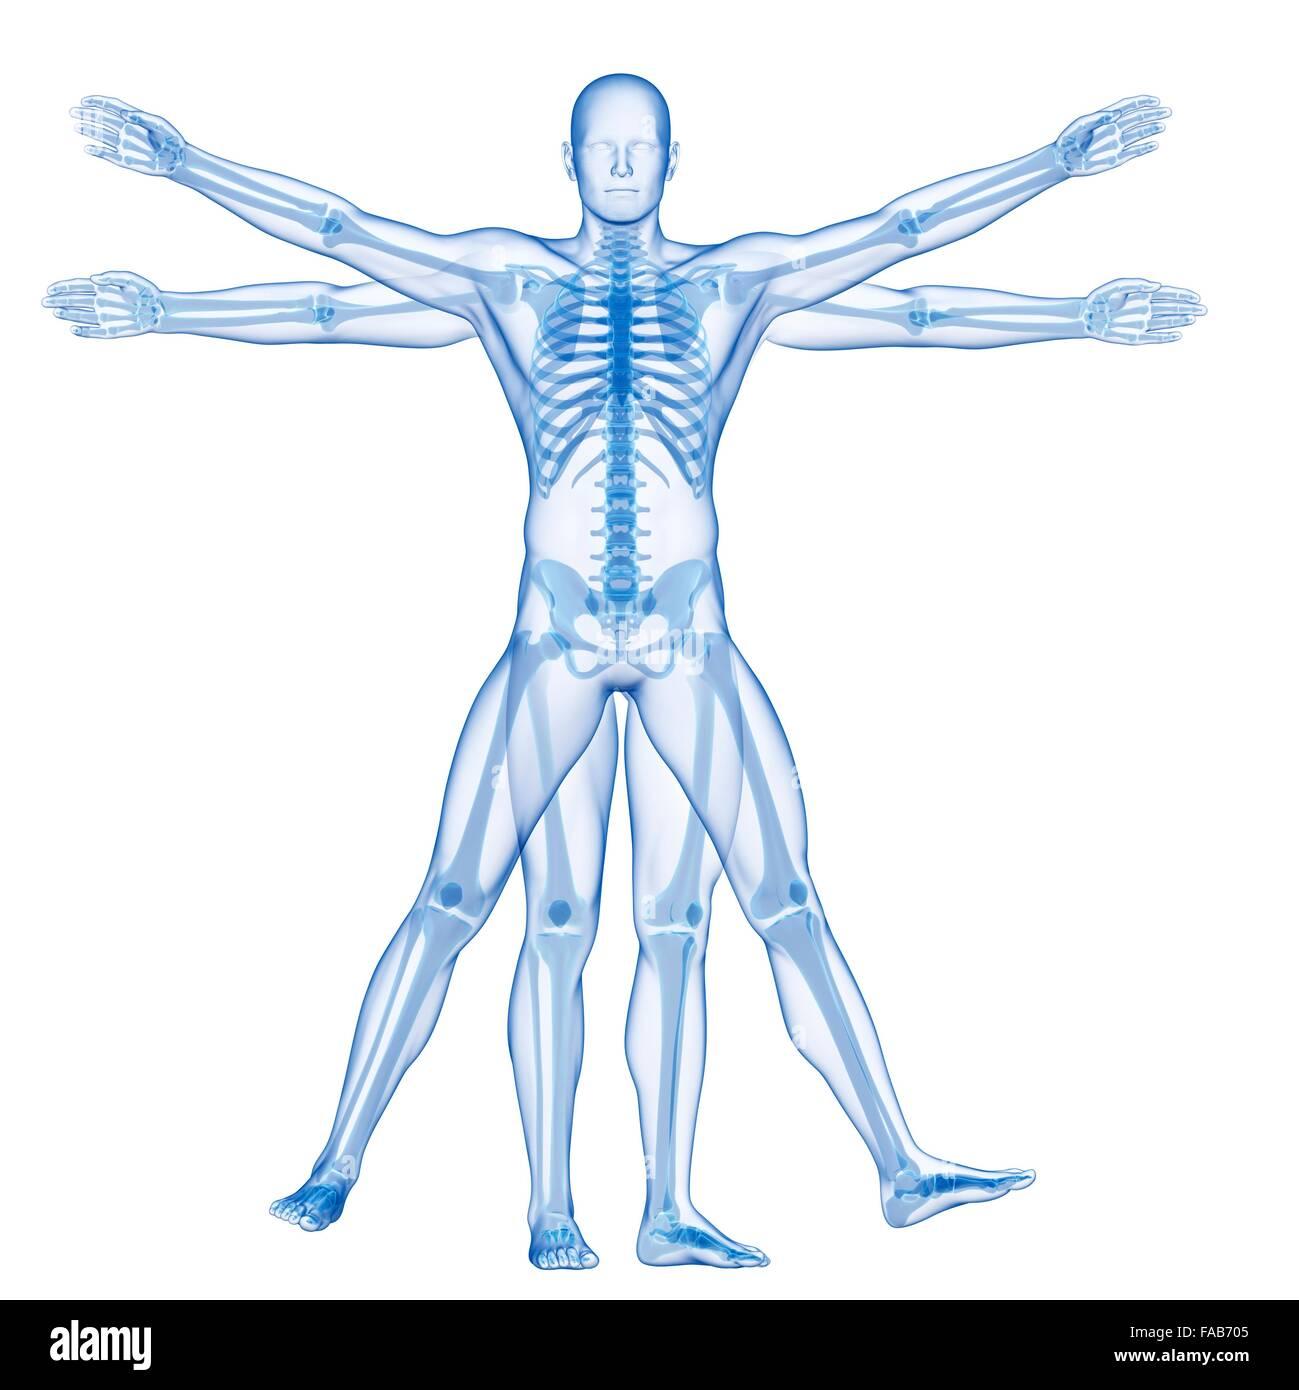 Menschliches Skelett-Systems (Vitruvian Mann), Computer-Illustration ...